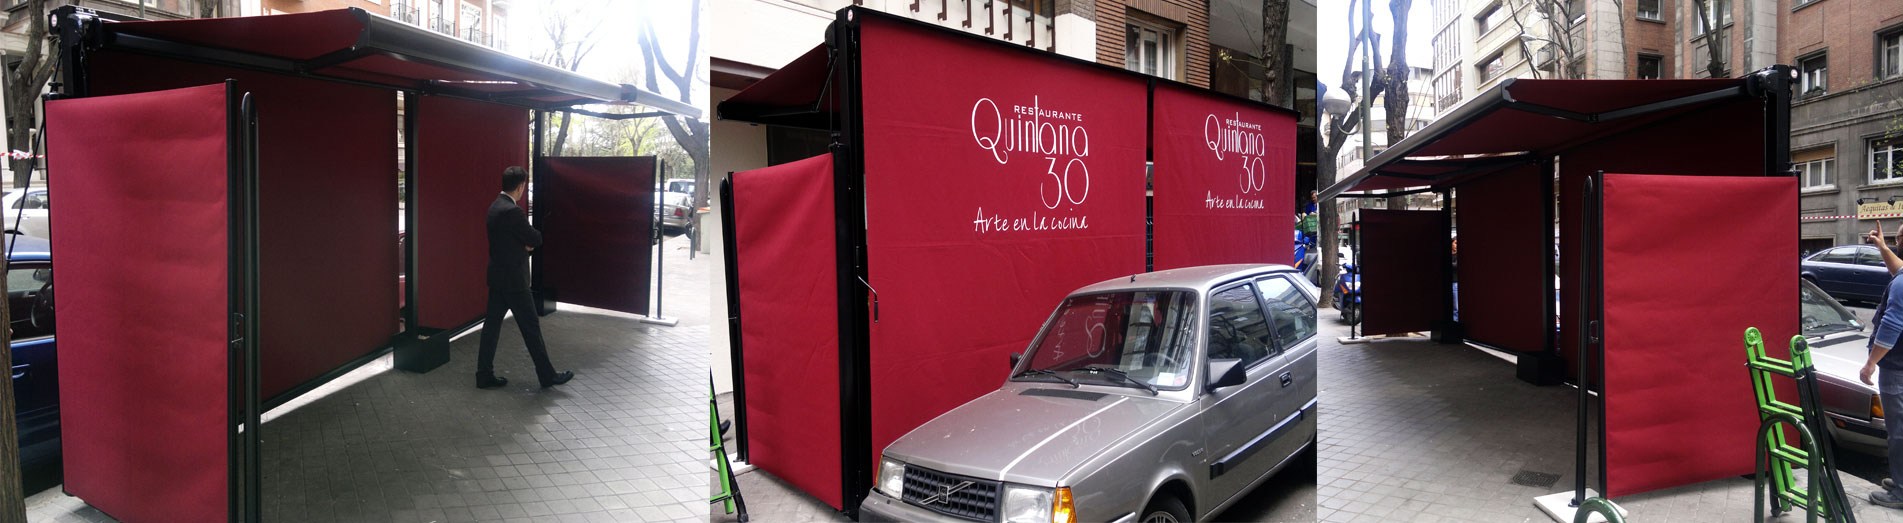 Slide Toldos en Madrid 01